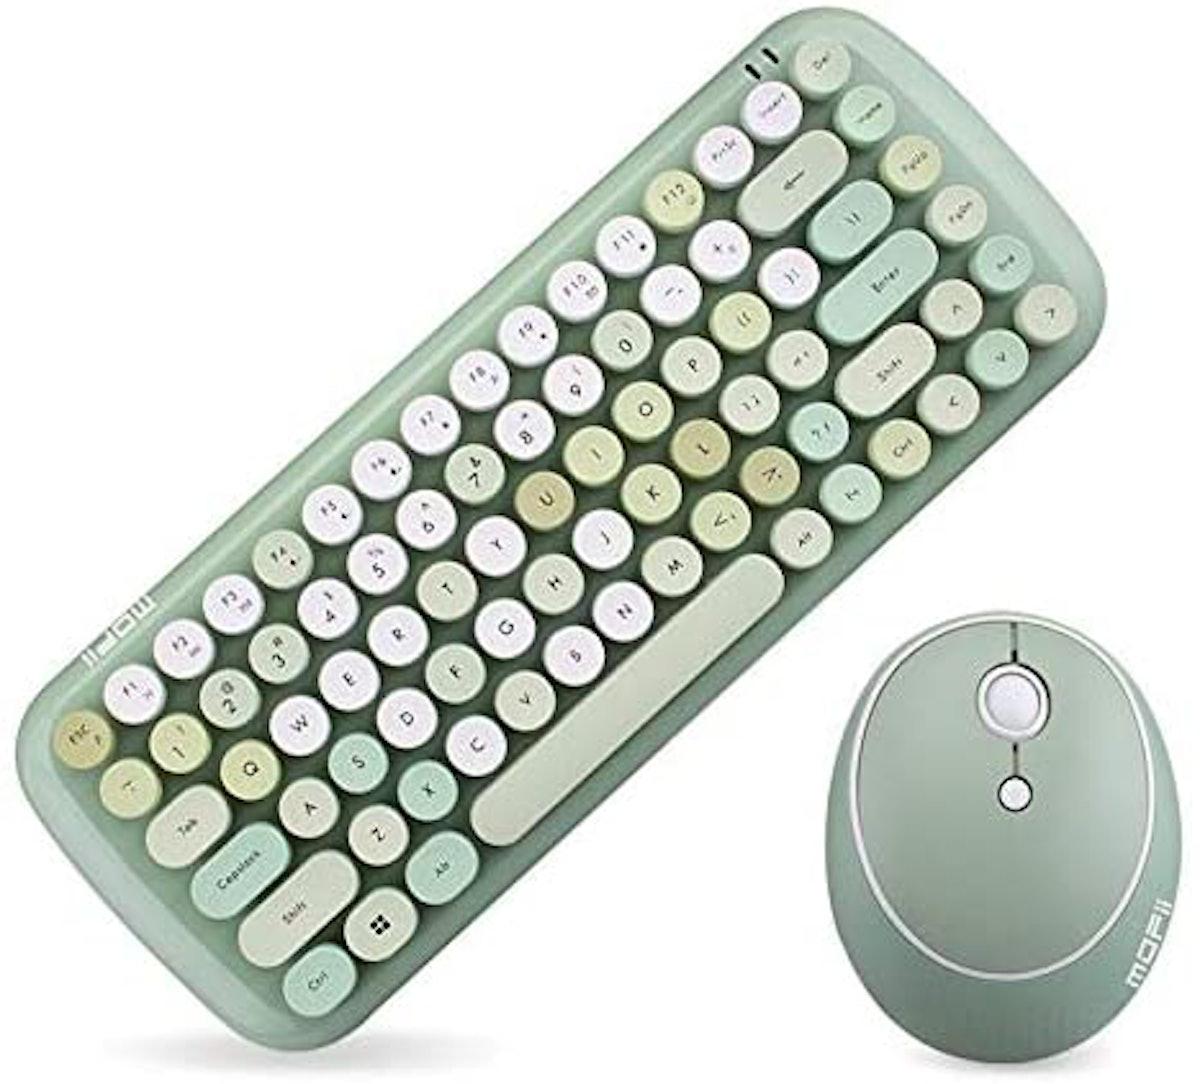 KBD Mini Wireless Keyboard Mouse Set